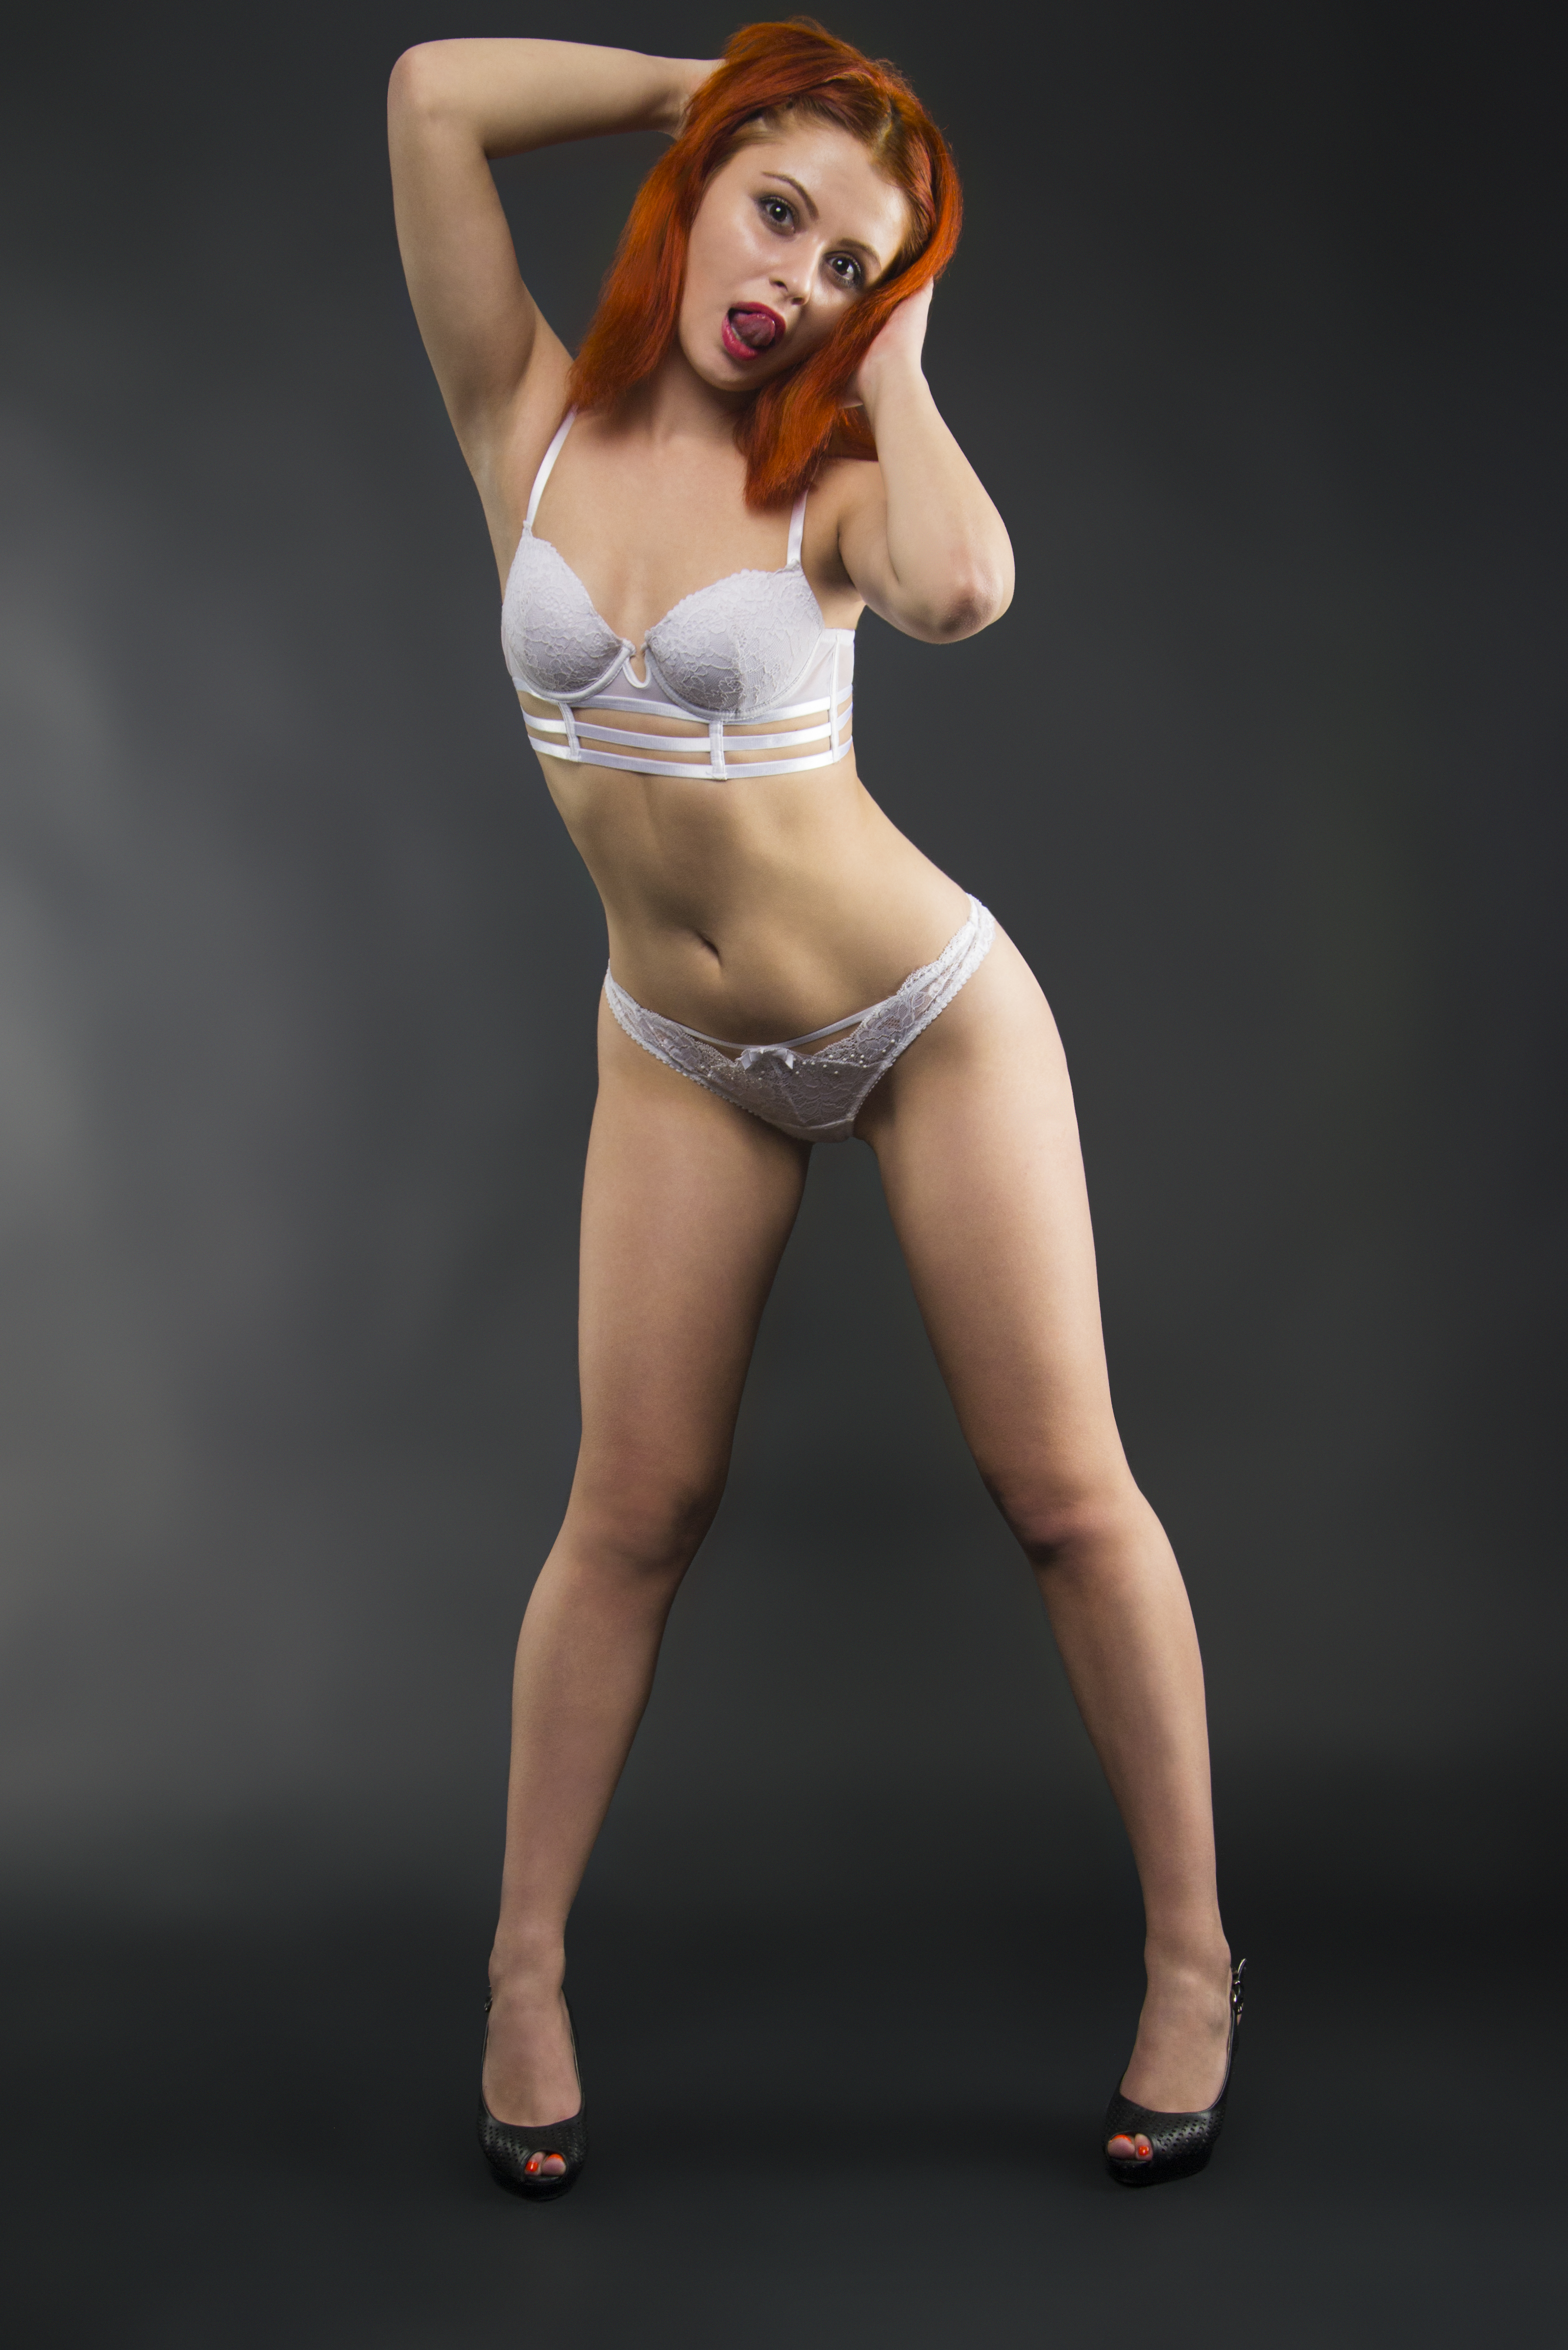 SexyKatia